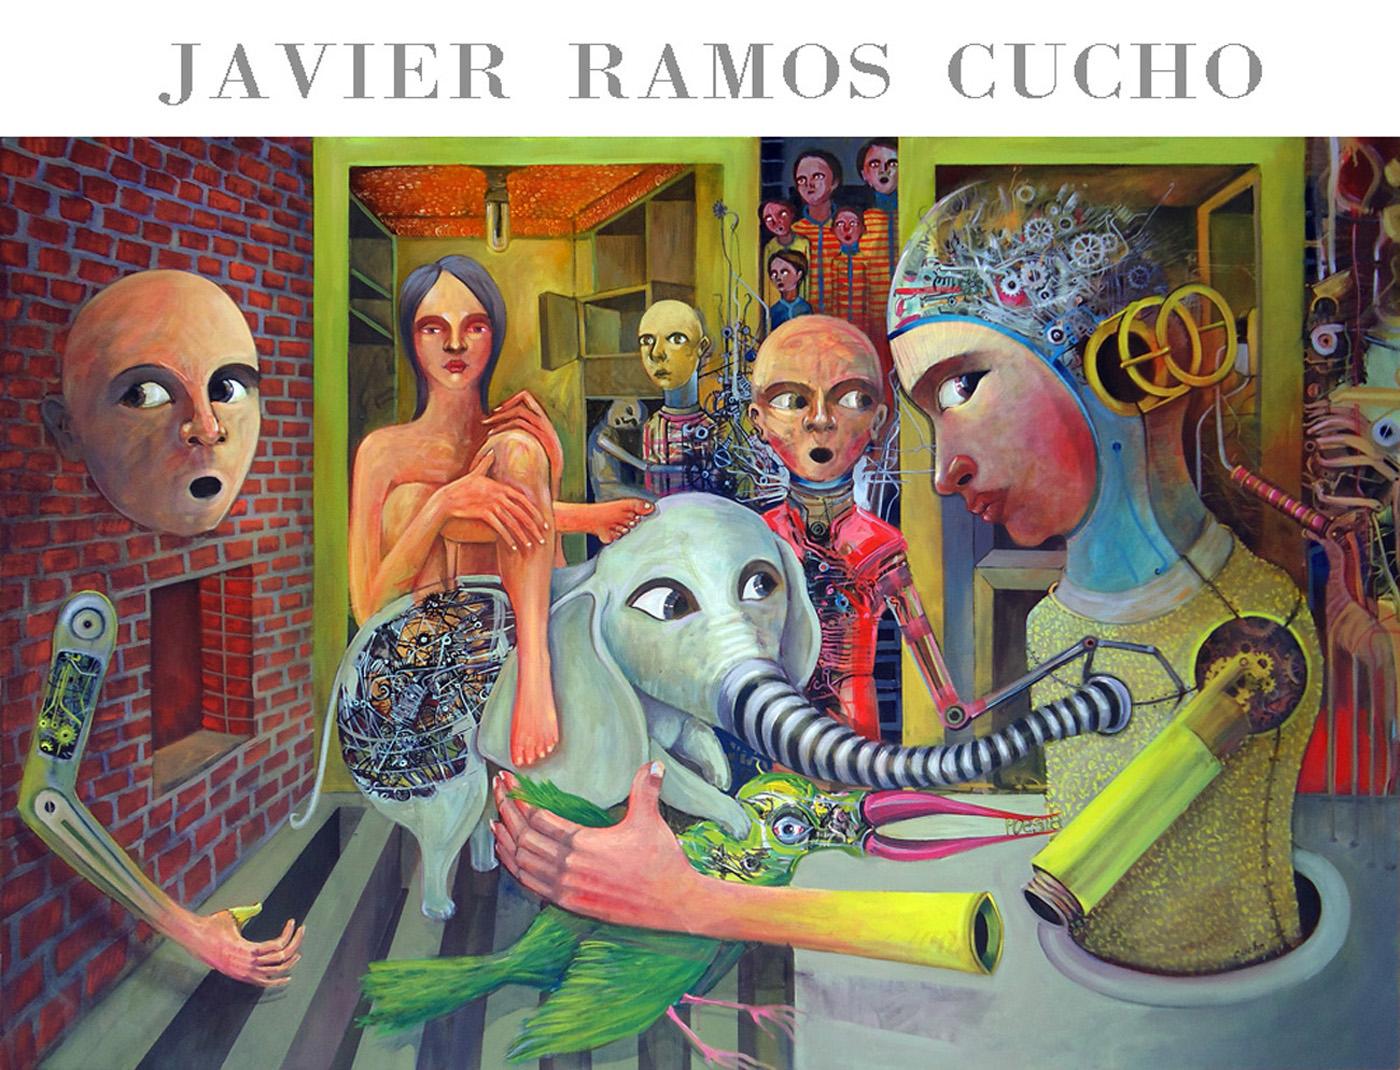 JAVIER RAMOS CUCHO